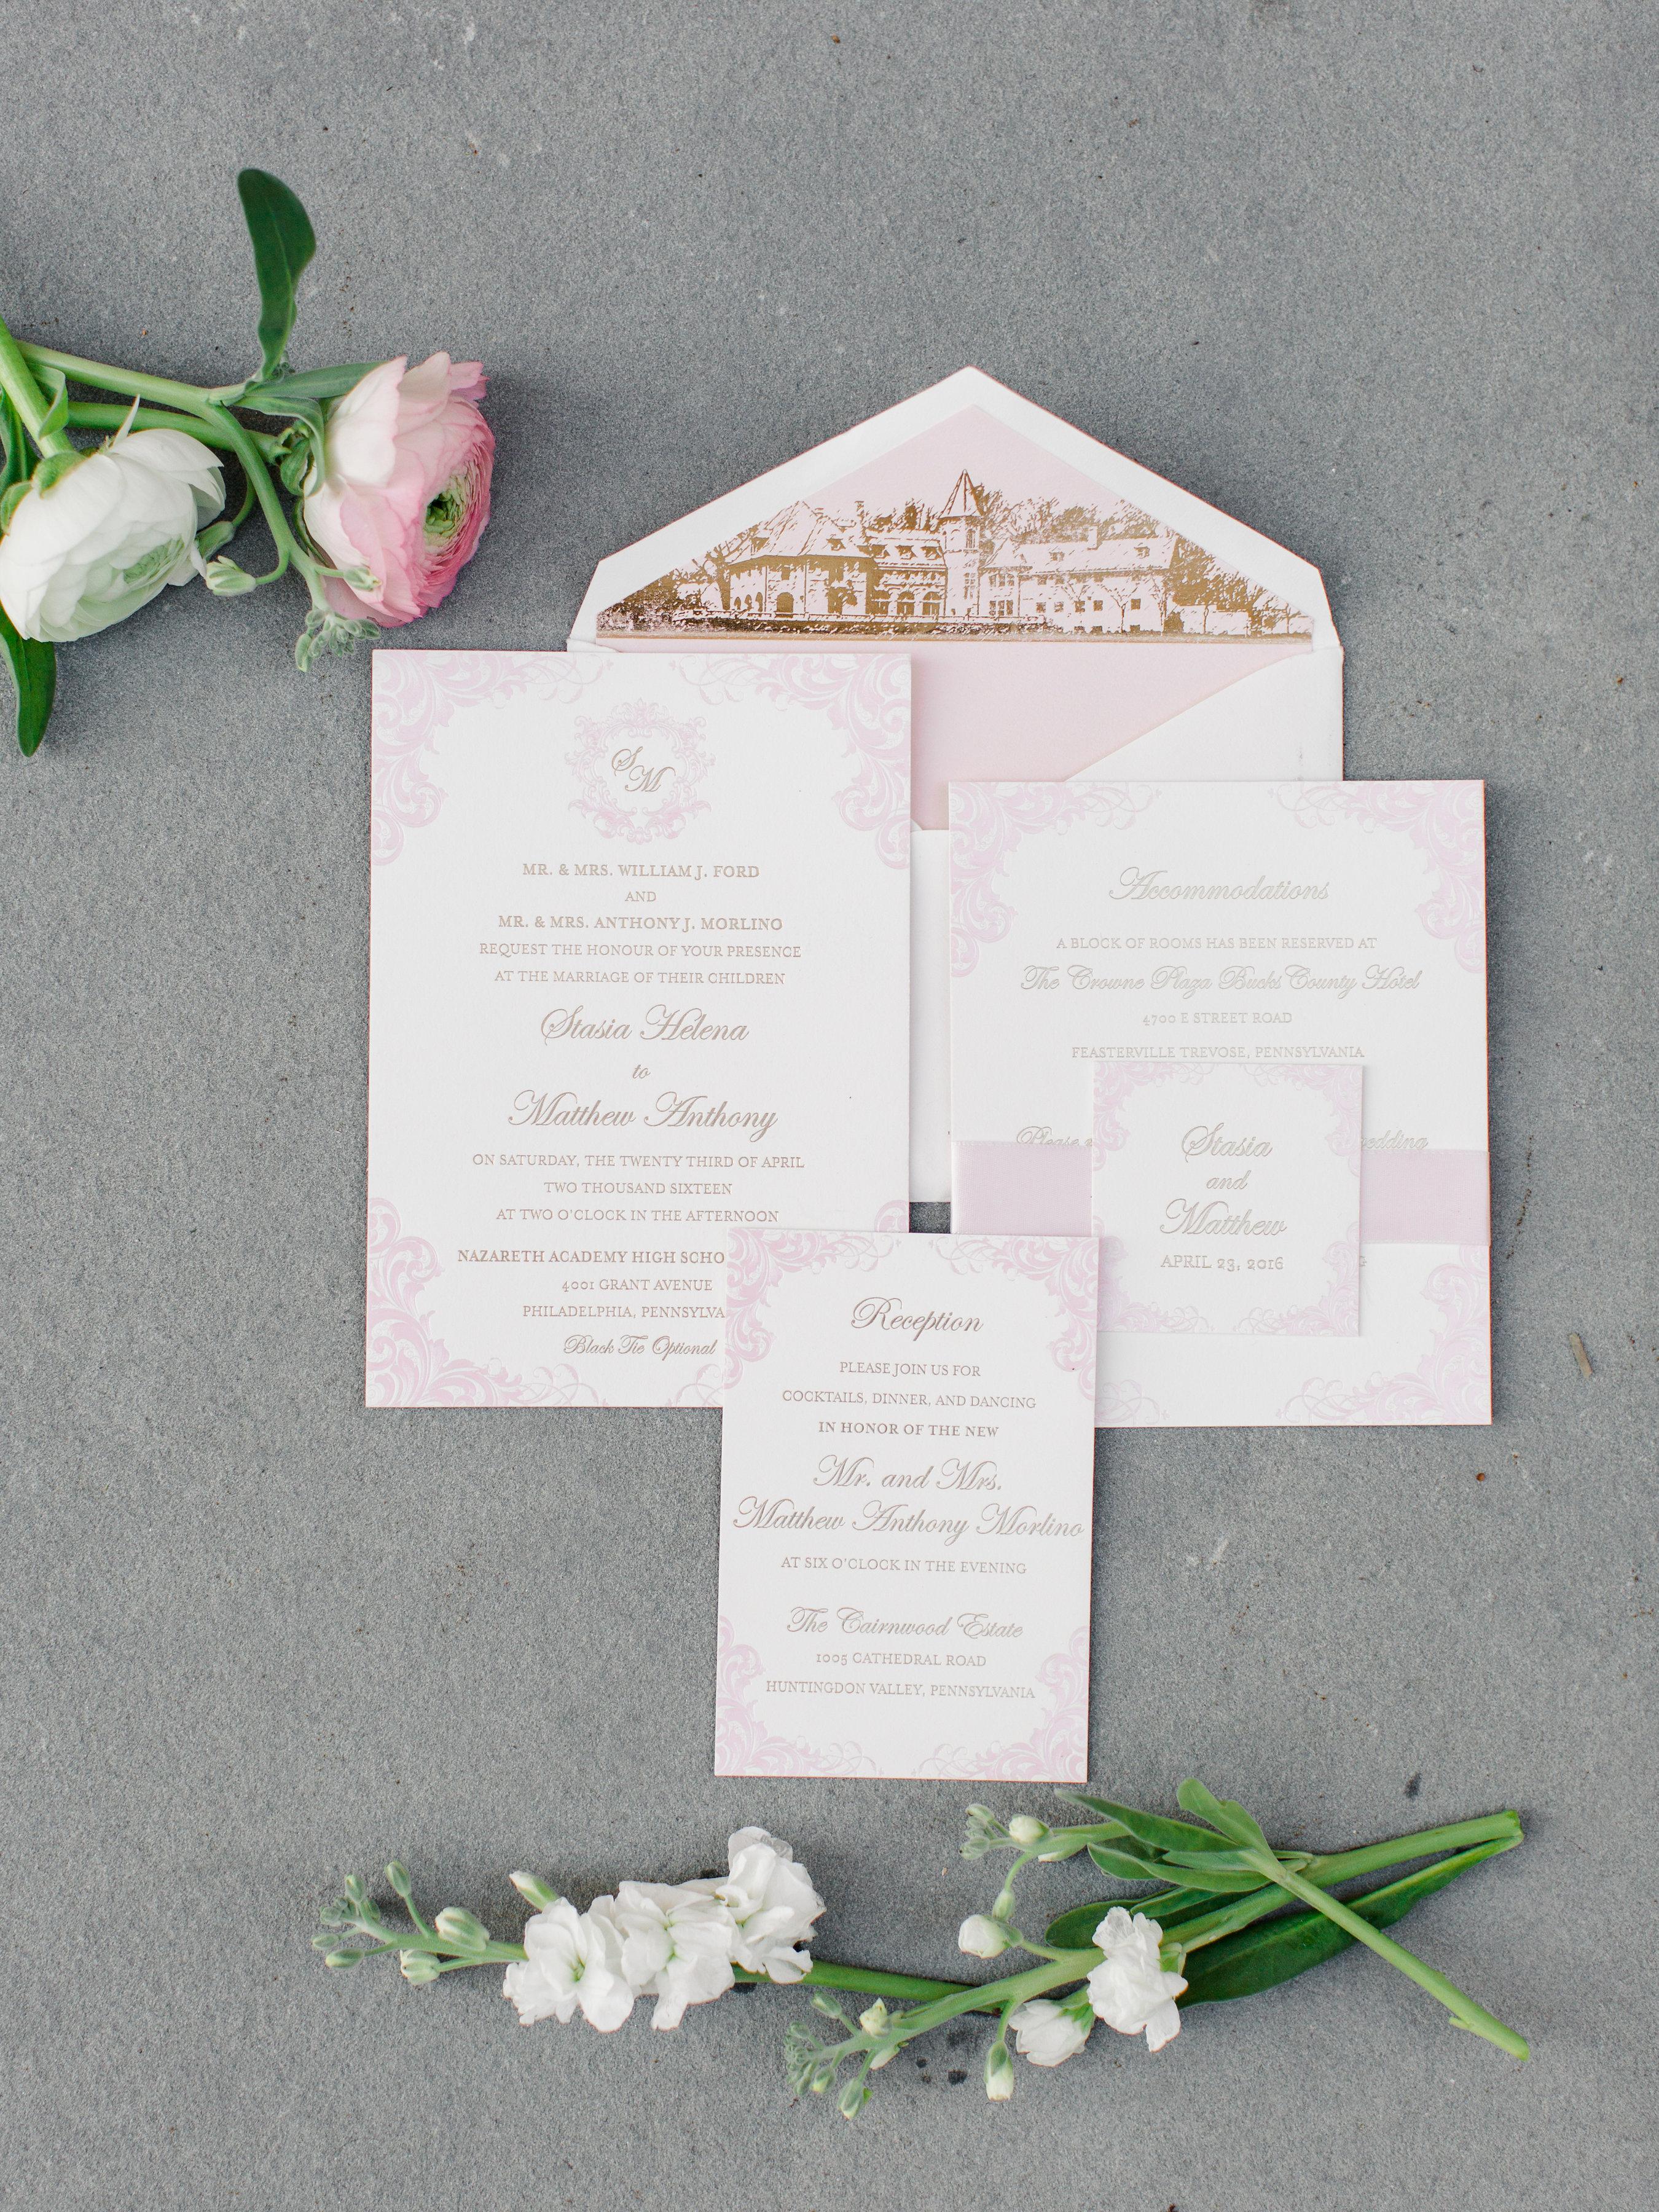 lauren_fair_photography_april_lynn_designs_stasia_matt_spring_cairnwood_estate_wedding_northeast_philadelphia_blush_pink_gold_wedding_invitation_stationery_00022